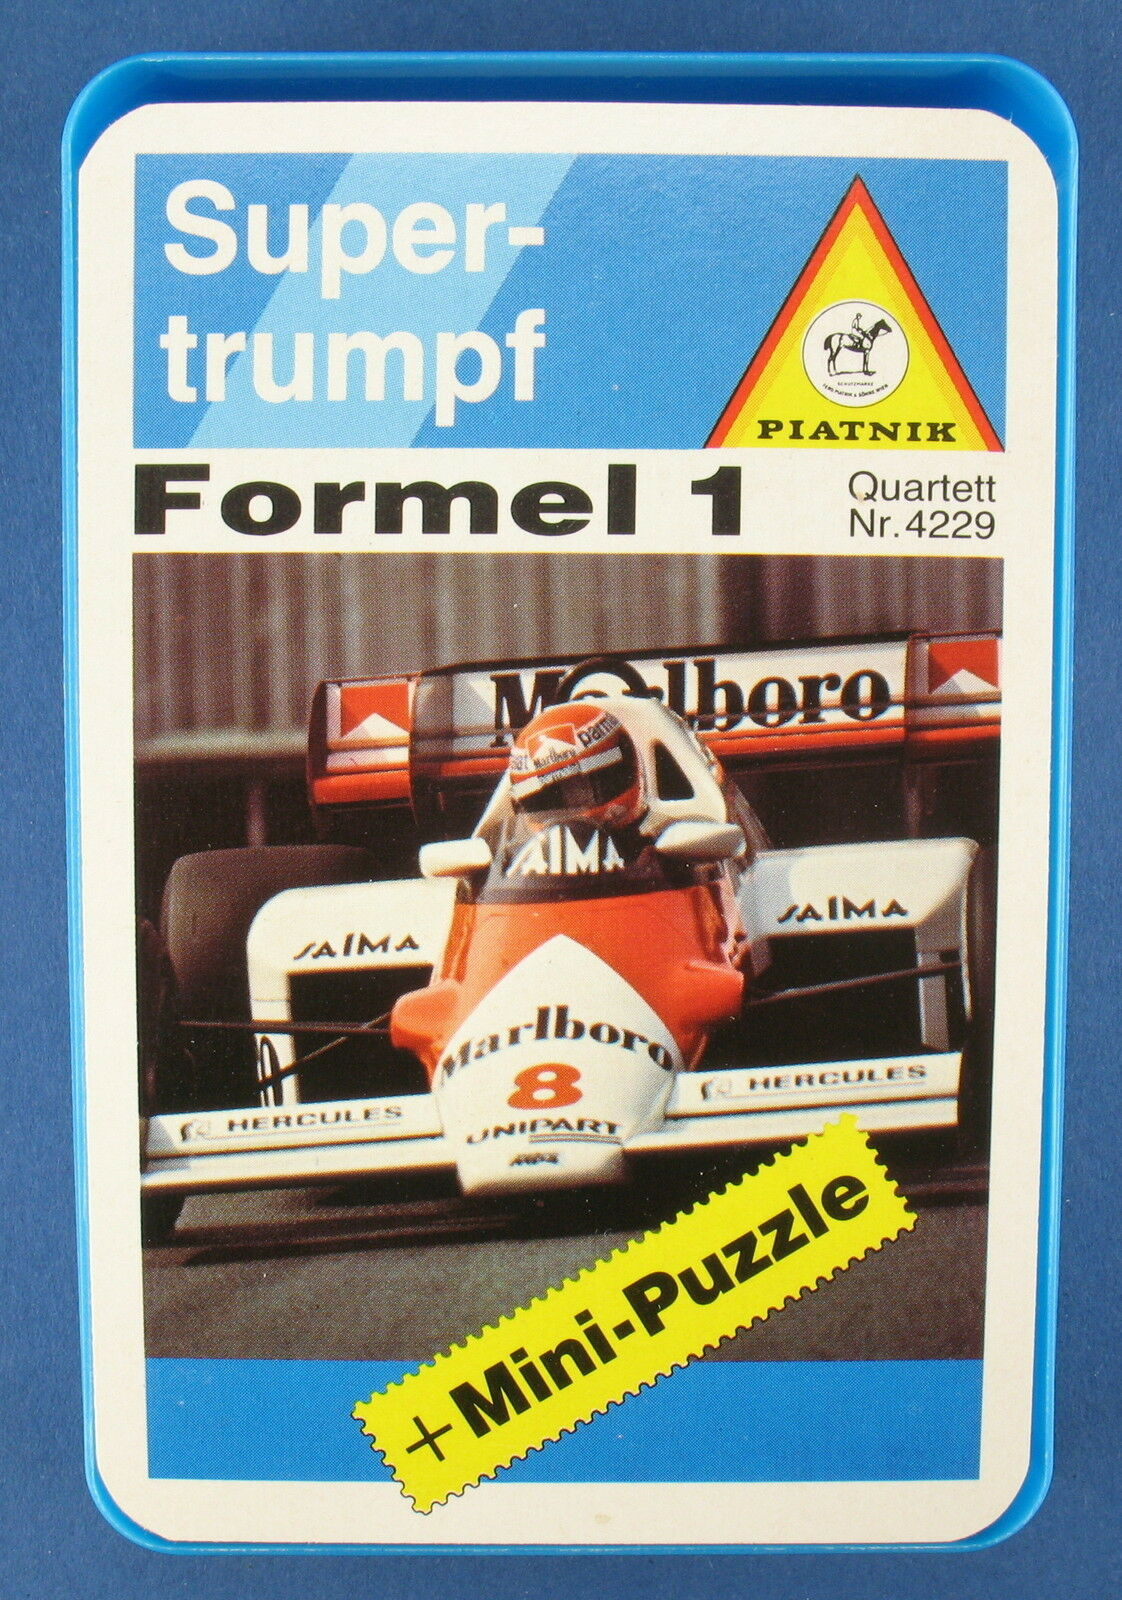 Quartett - Formel 1 - Piatnik + 2 Mini-Puzzle - Nr. 4229 - Auto Kartenspiel